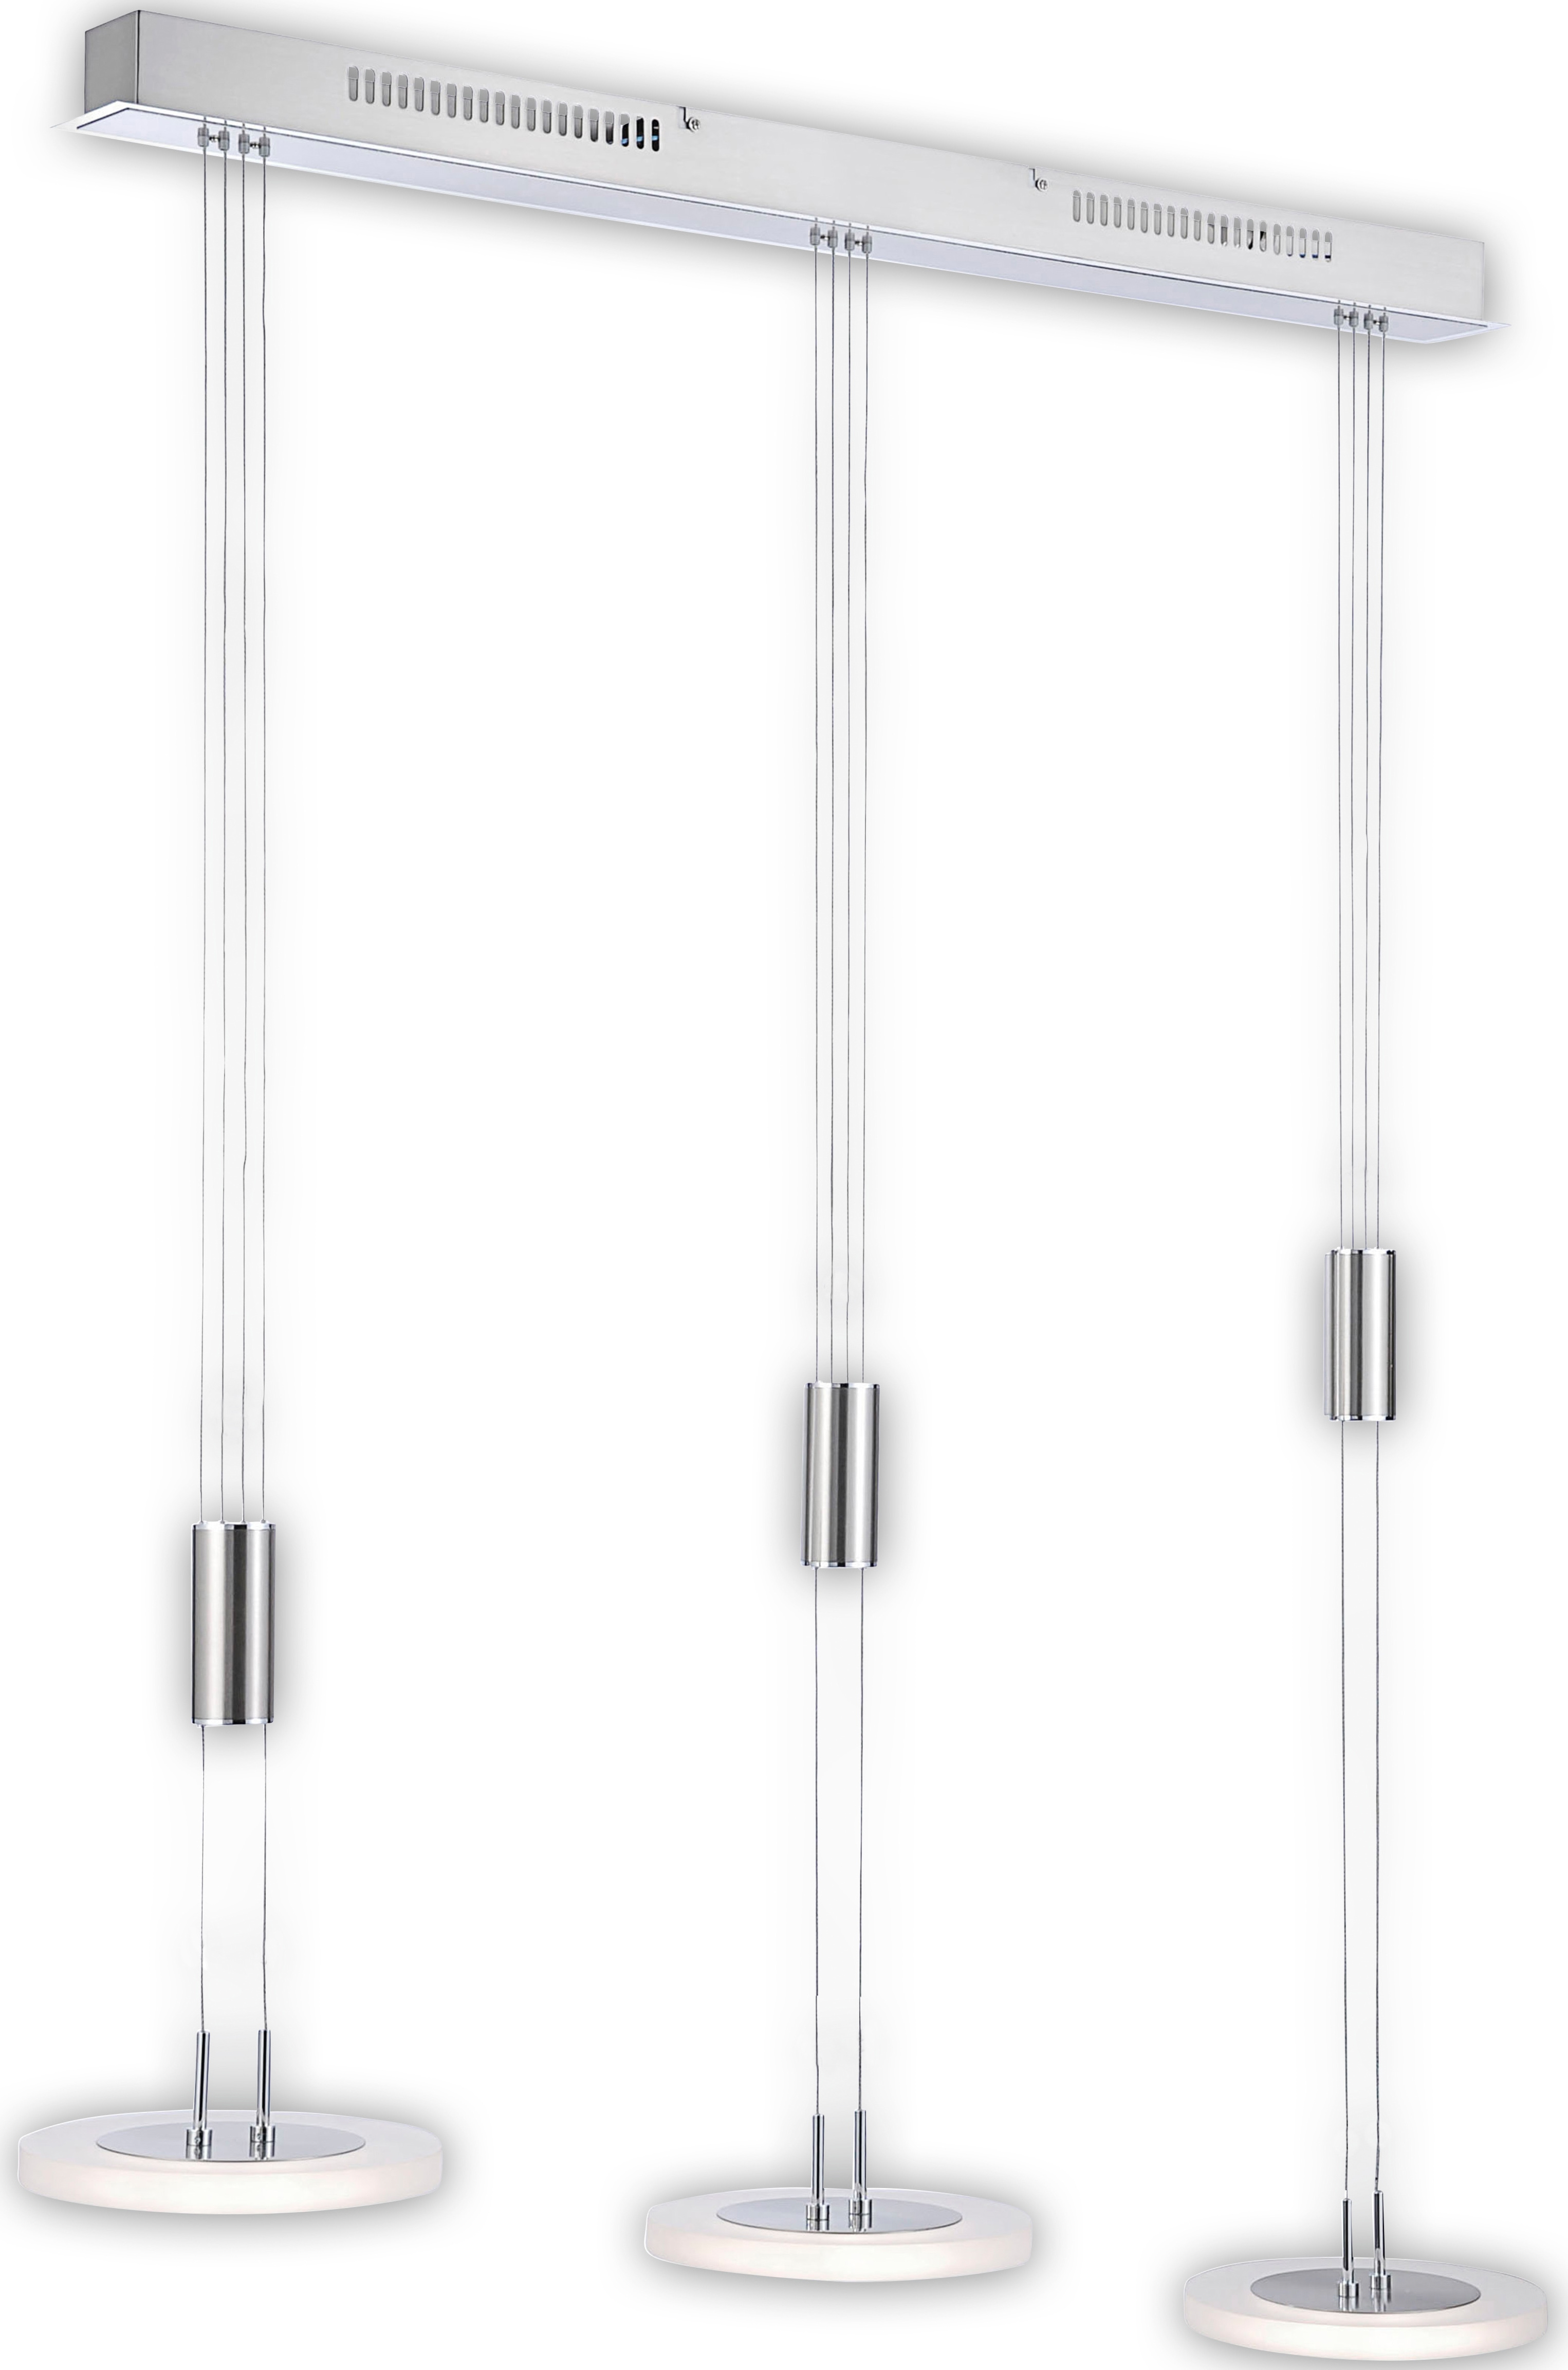 FISCHER & HONSEL LED Pendelleuchte Diskus, LED-Modul, Warmweiß